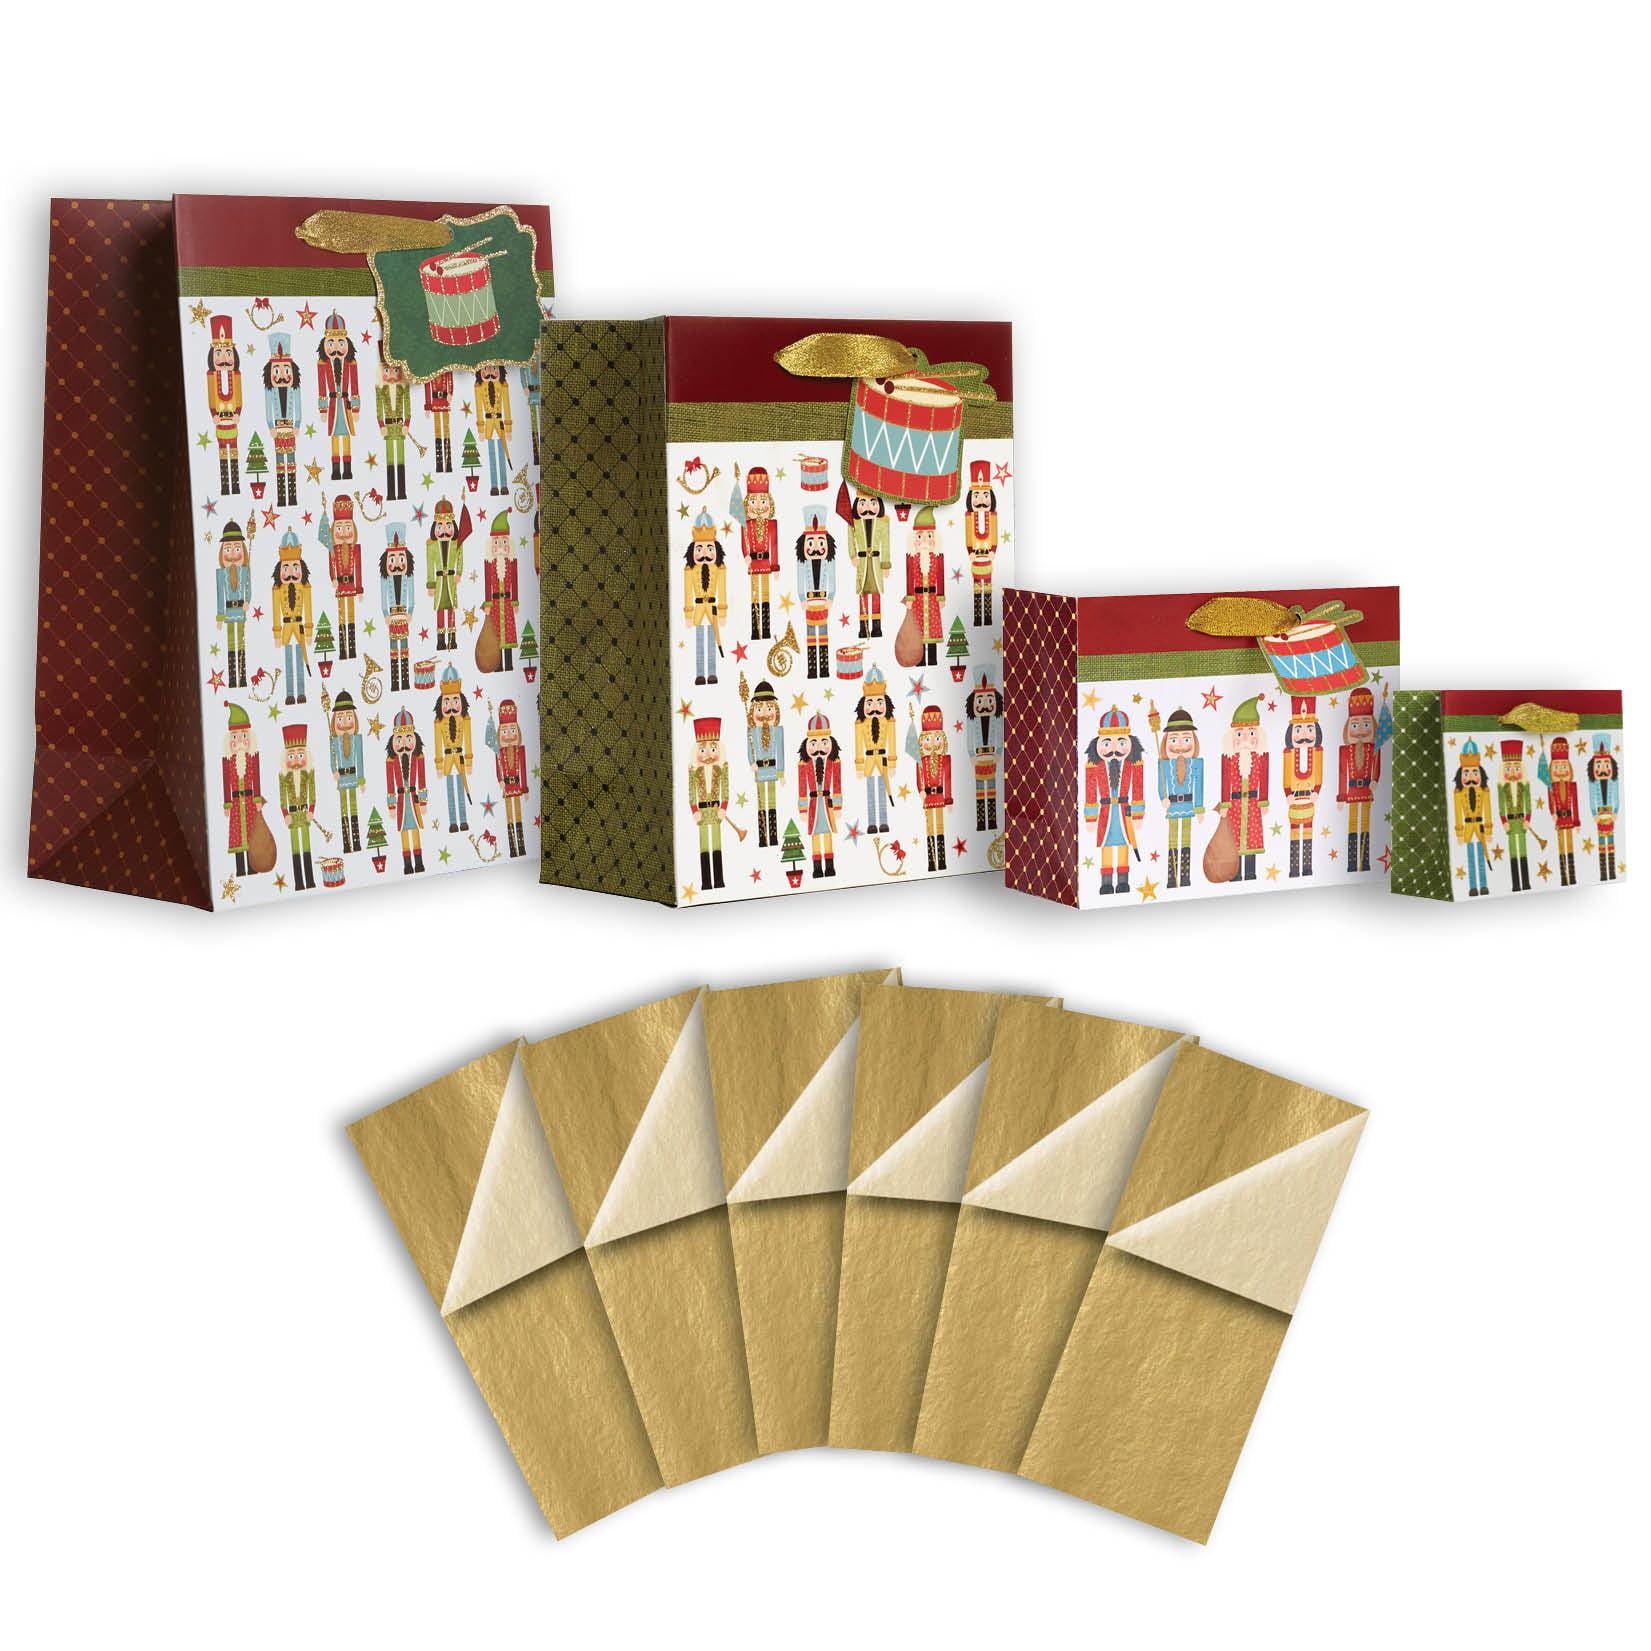 Jillson & Roberts Gift Bag & Tissue Assortment, Nutcracker Christmas (4 Bags)